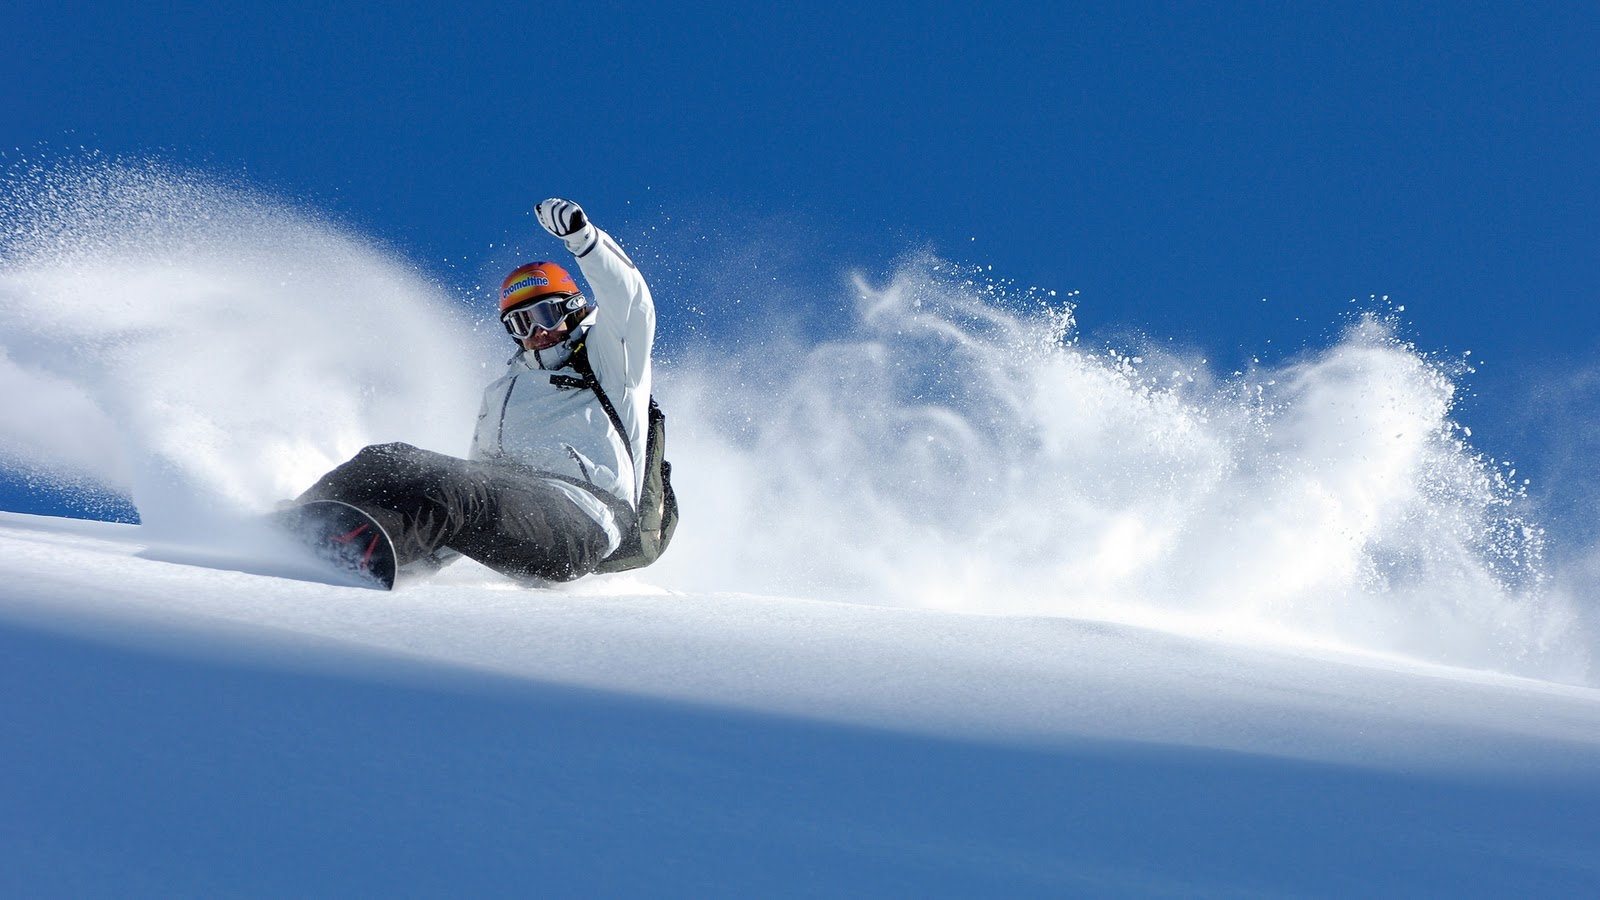 75 Snowboard Wallpaper On Wallpapersafari